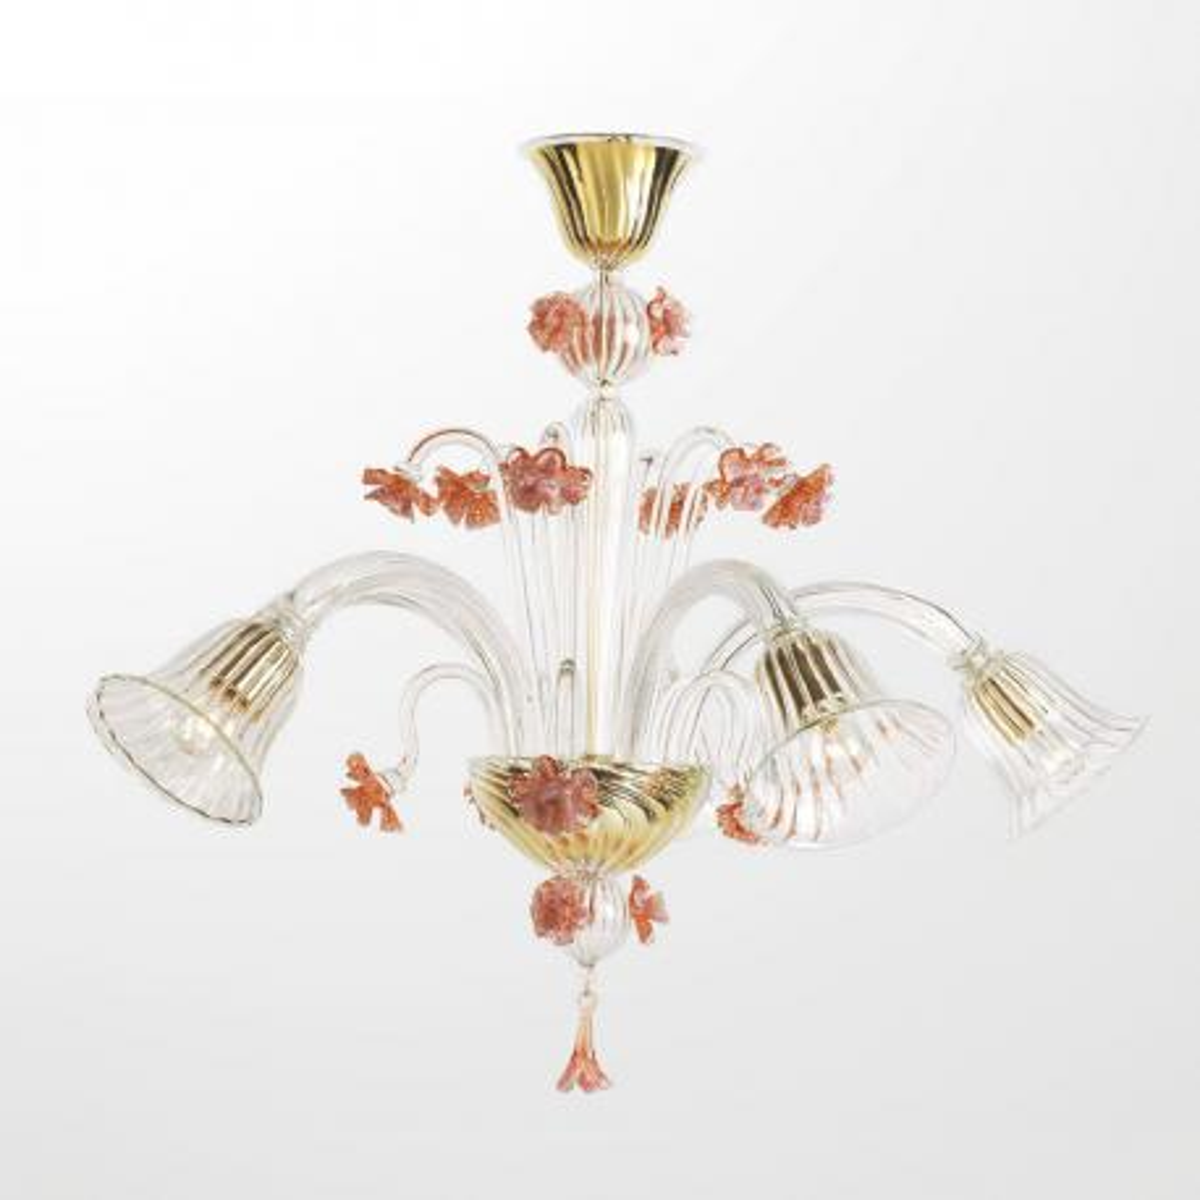 """Megan"" Murano glas Kronleuchter - 5 flammig - transparente und rosa"